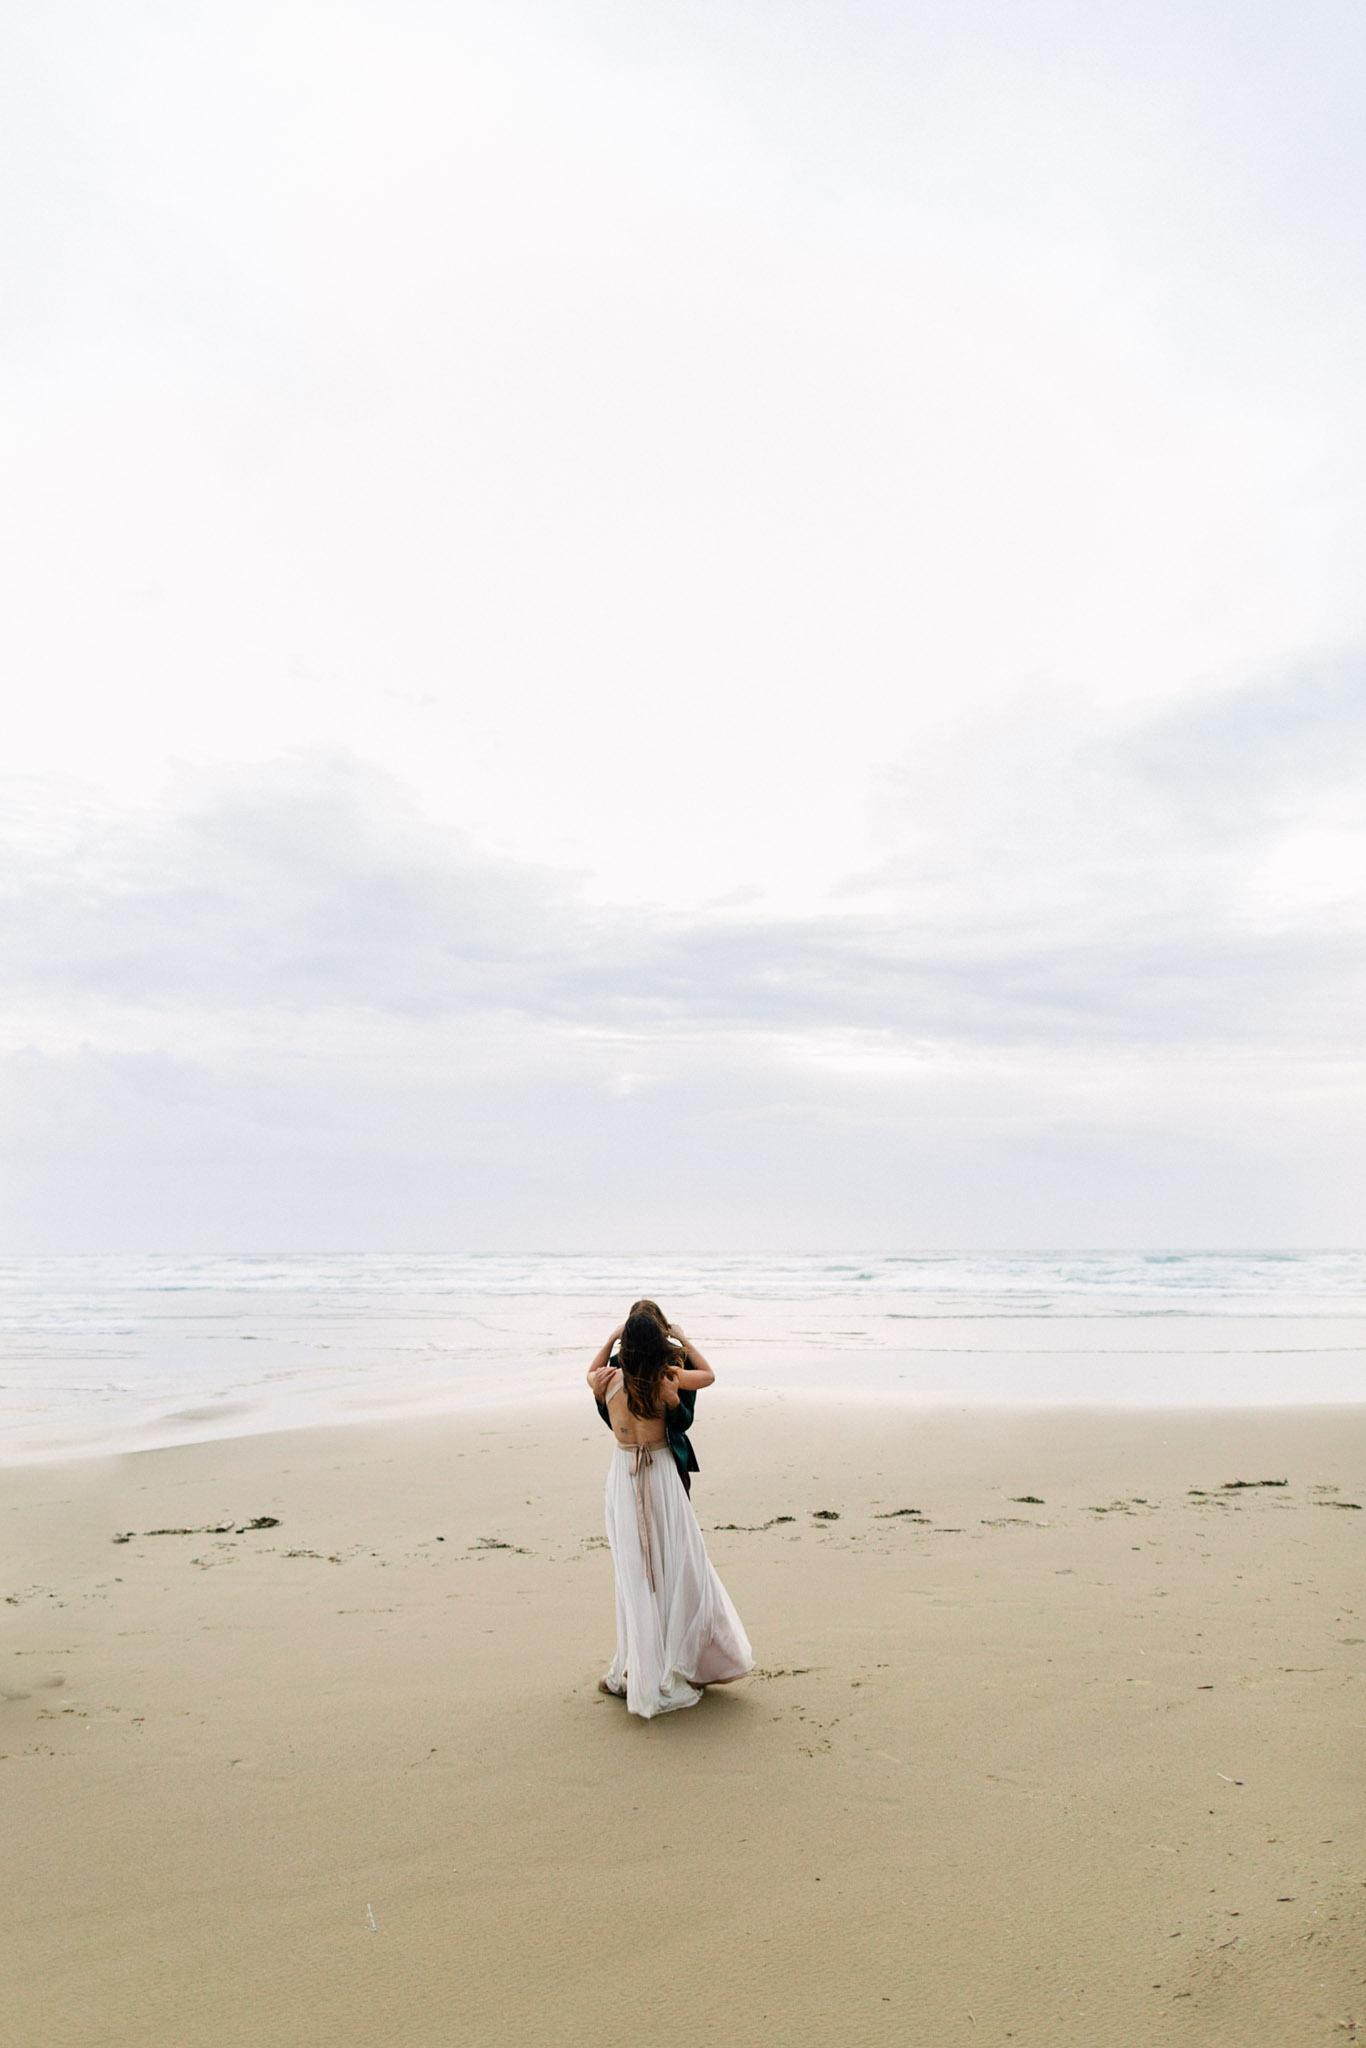 Oregon-Coast-Manzanita-Beach-Engagement-Pia-Anna-Christian-Wedding-Photography-PNW-GB-2.jpg